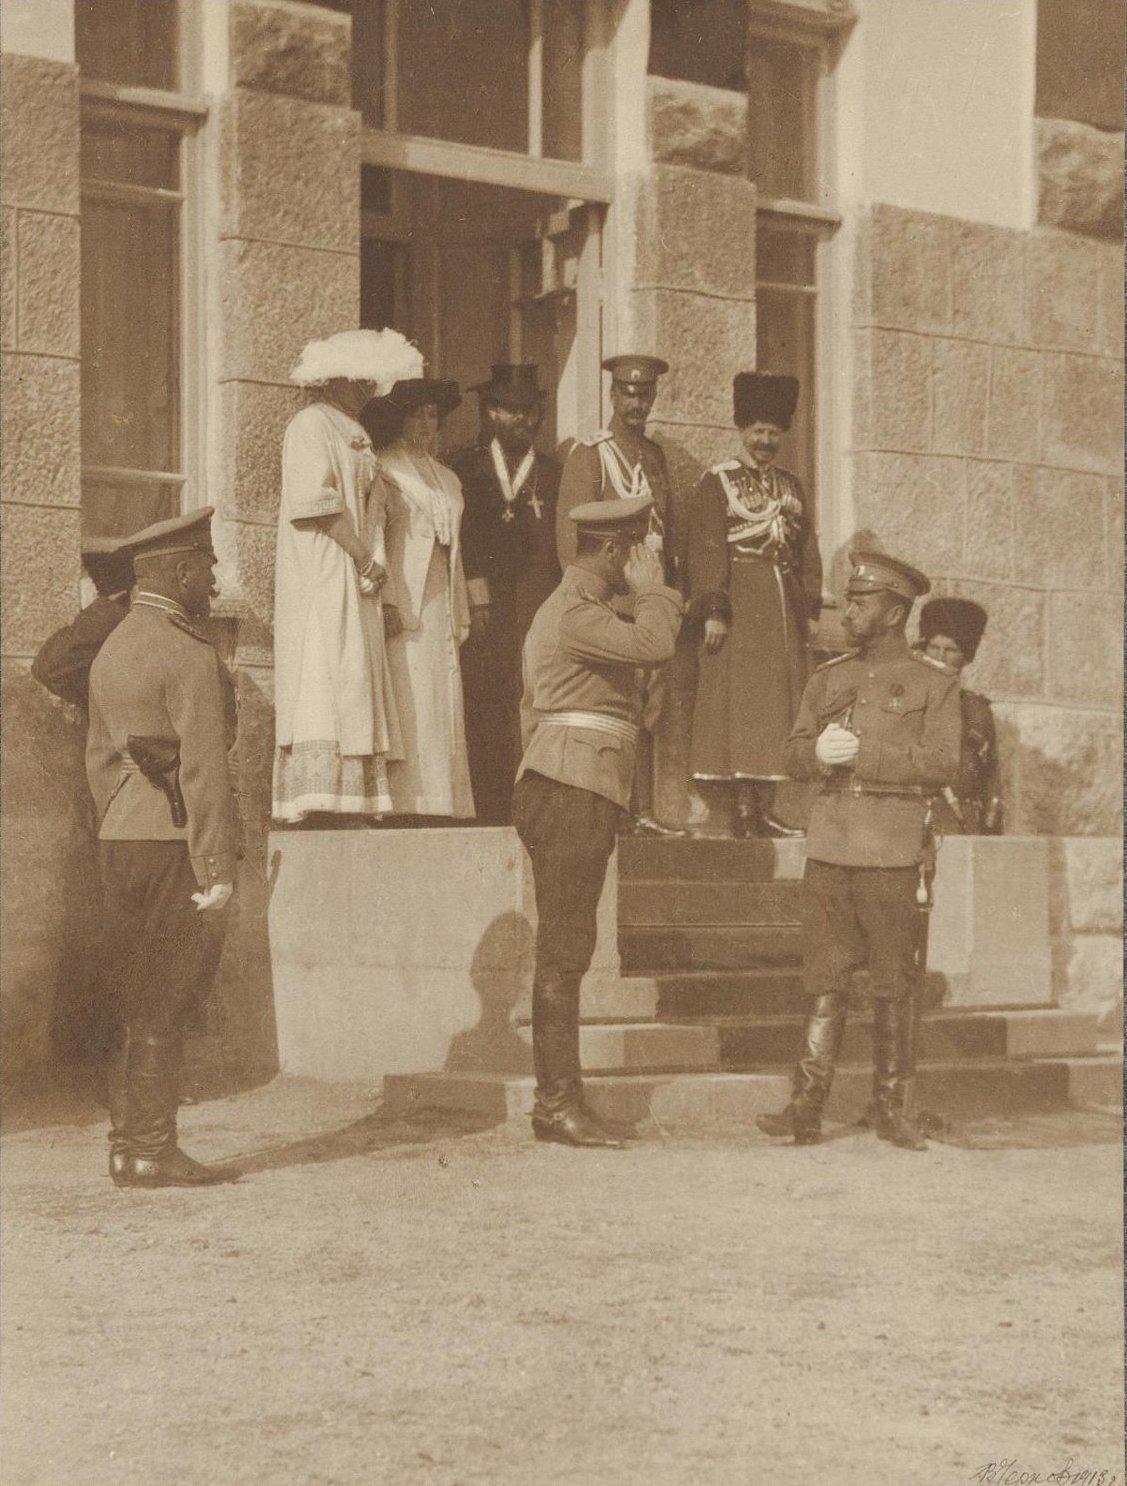 1913. Пребывание Николая II в Ореанде. Николай II у входа во дворец. 24 октября